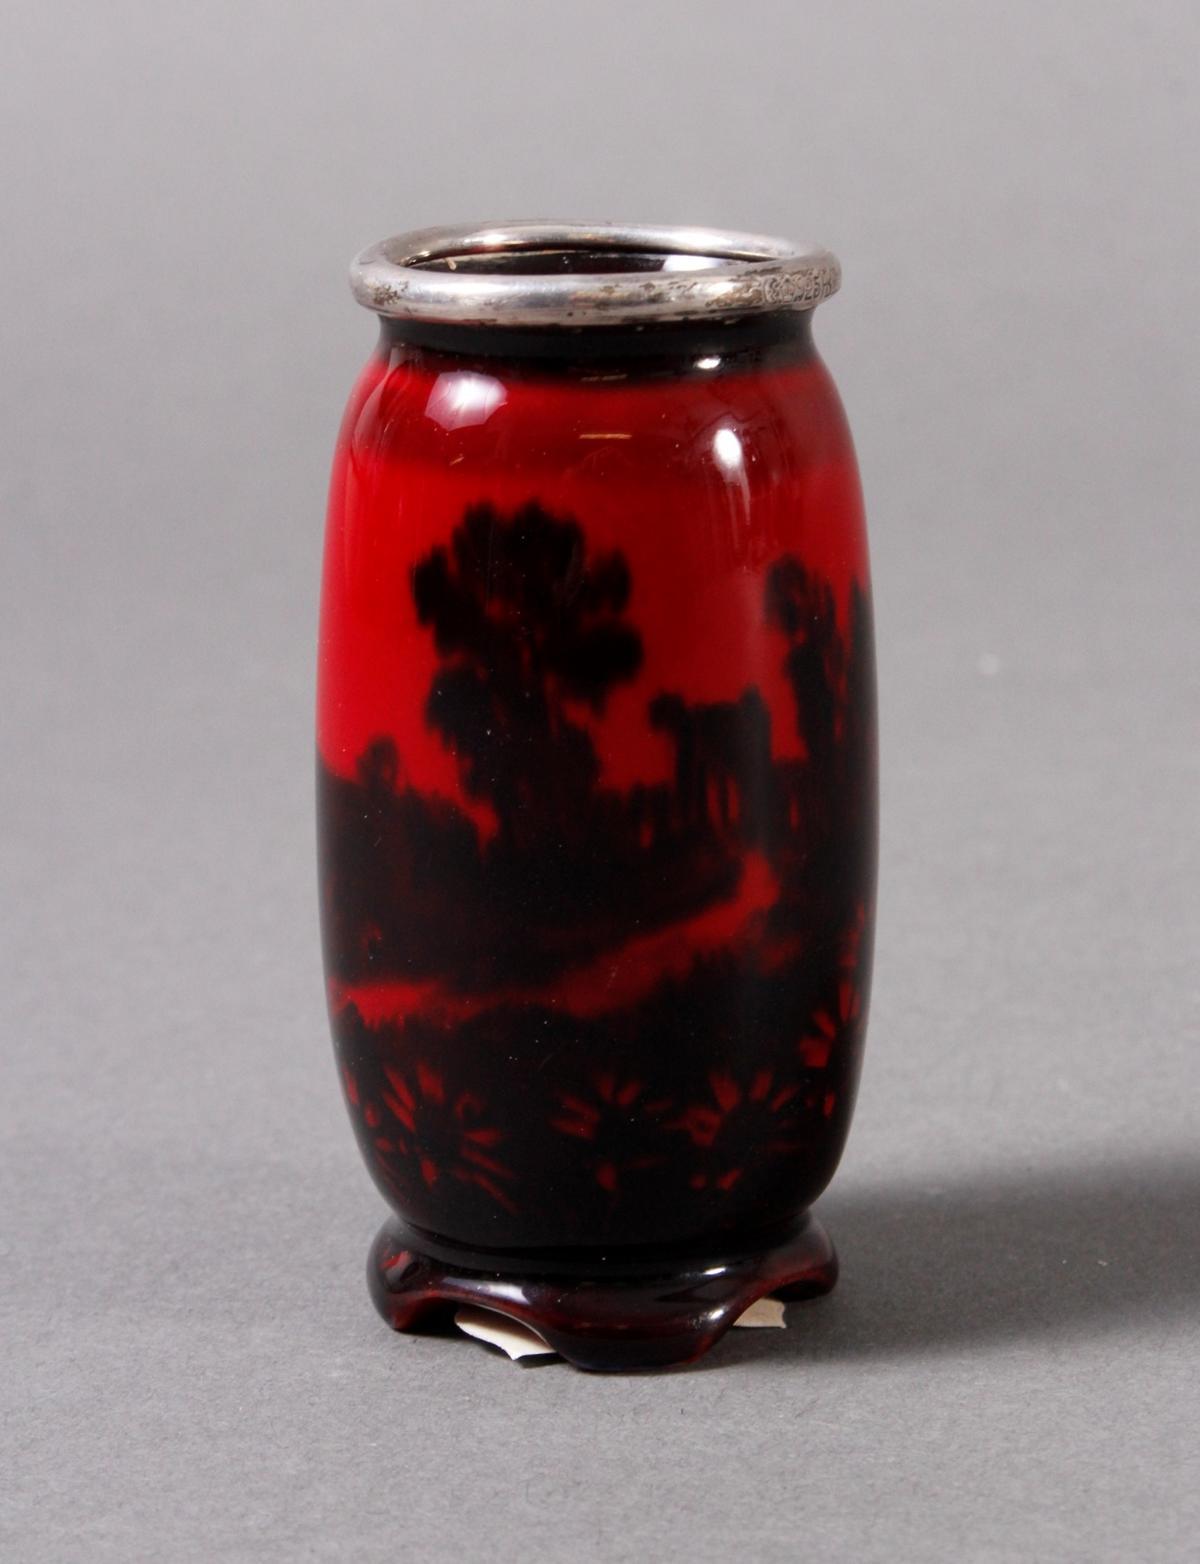 Keramik Ziervase, Flambe, Royal Doulton um 1910-2